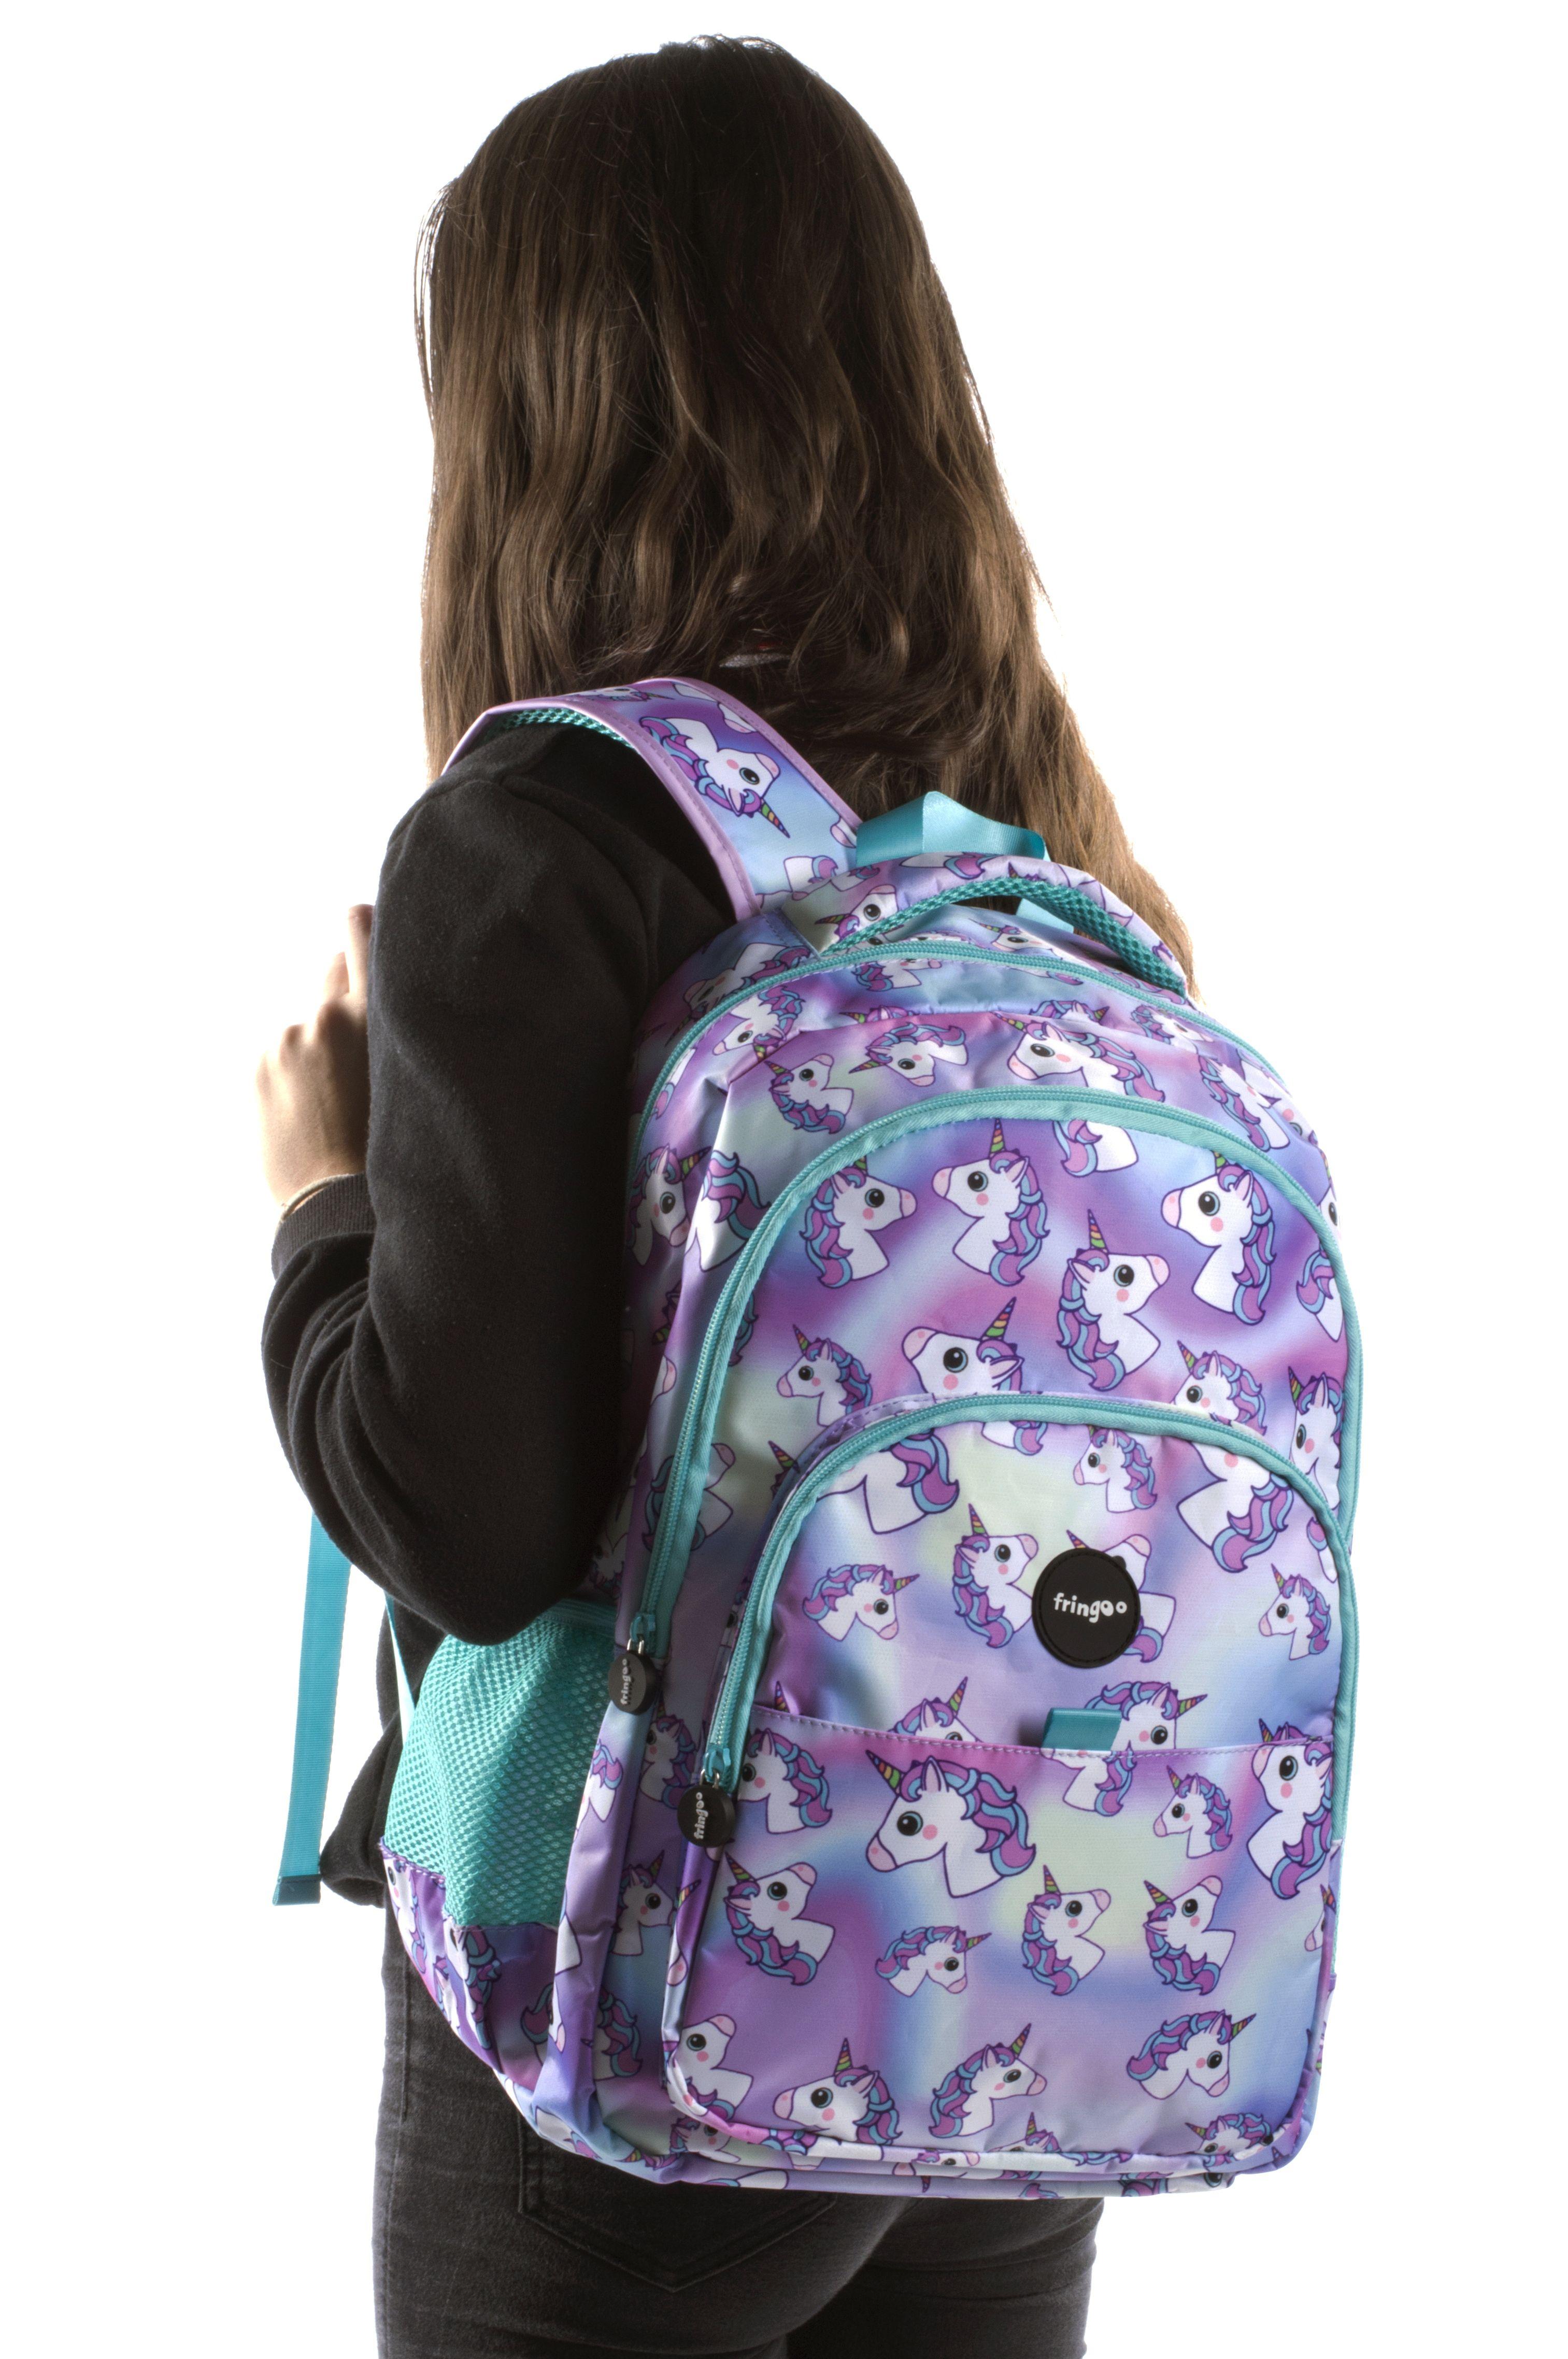 eba2dd8cd450 Multi Compartment Backpack - Hologram Unicorns